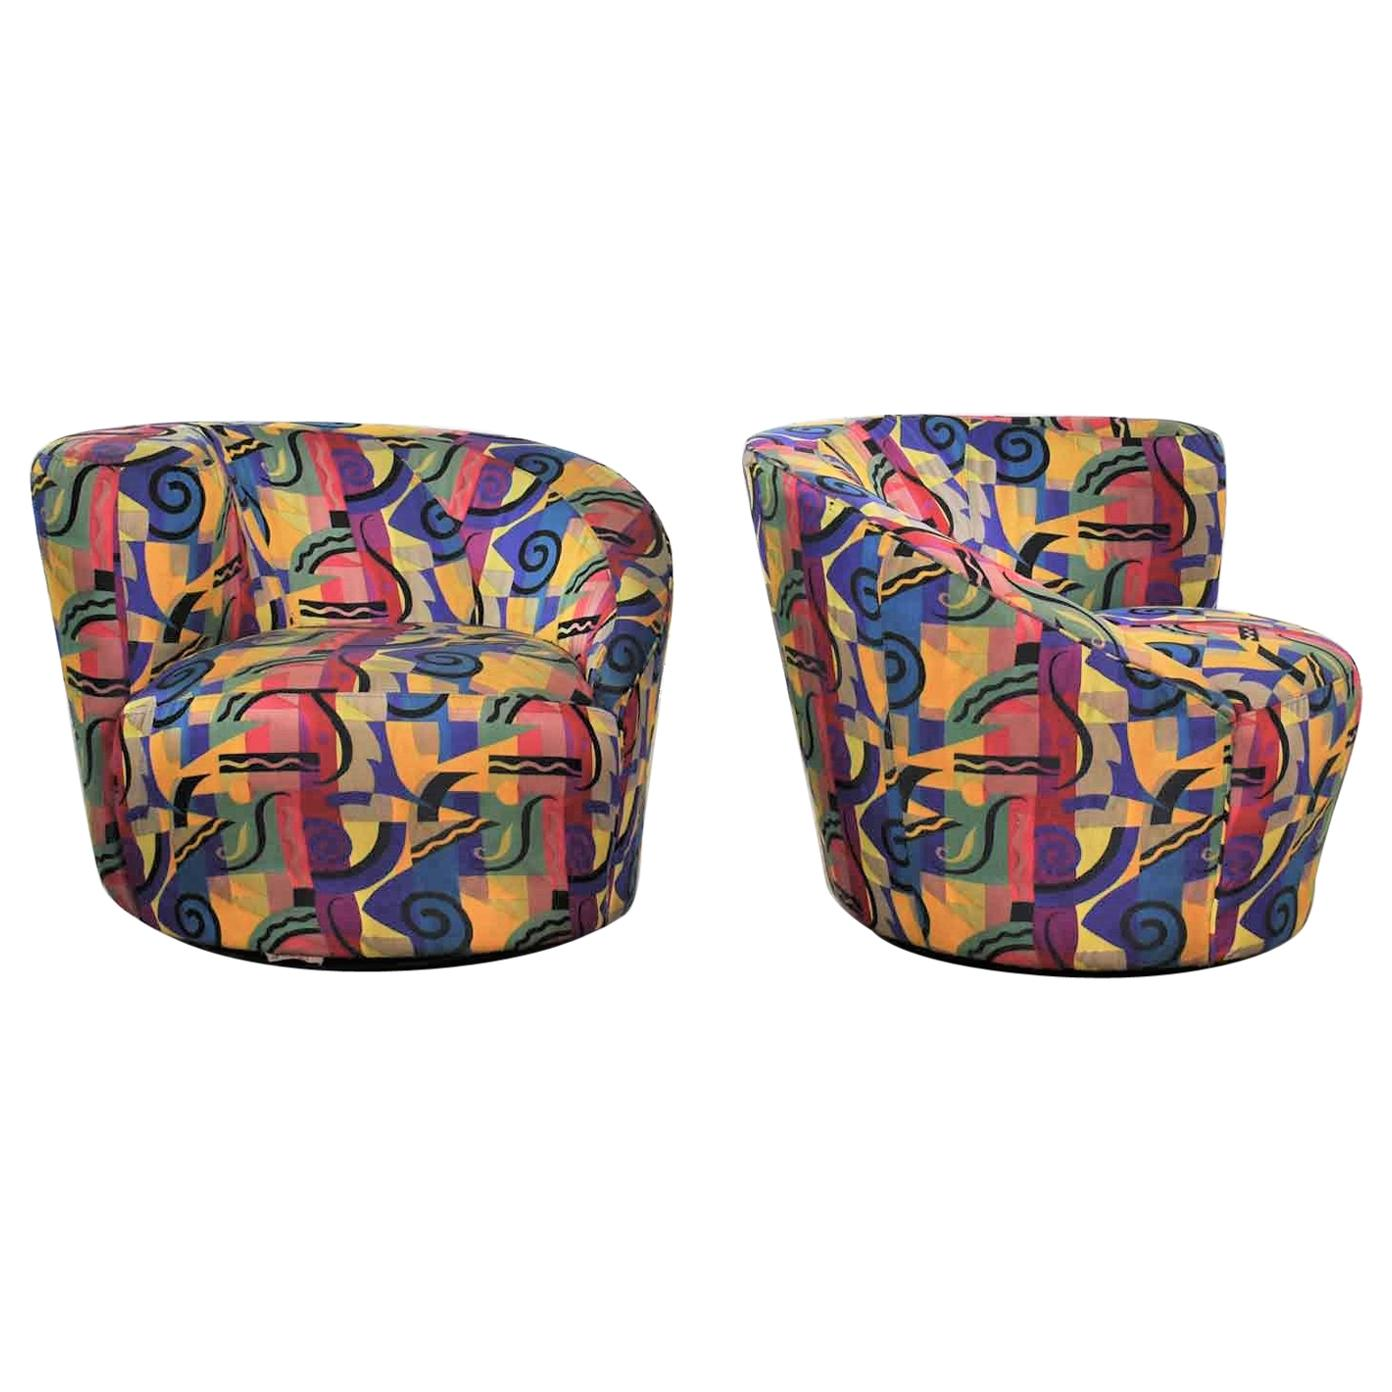 Pair of Asymmetric Nautilus Swivel Chairs